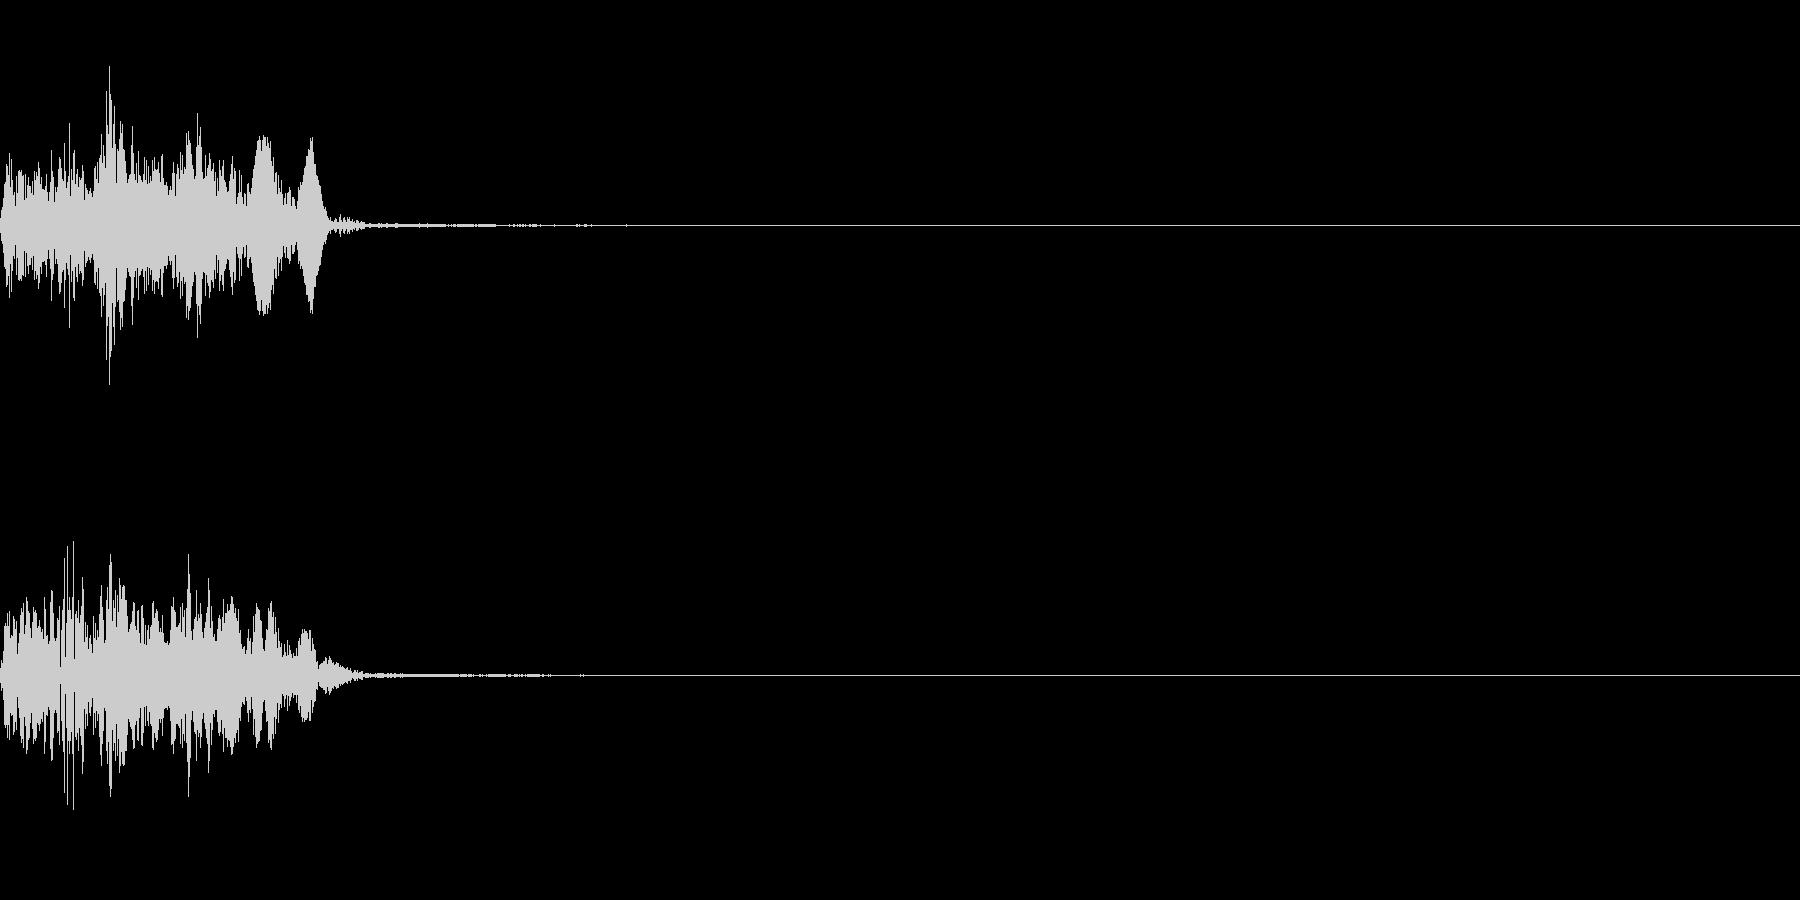 SF系ワンショット(ビヒャーオゥ)の未再生の波形